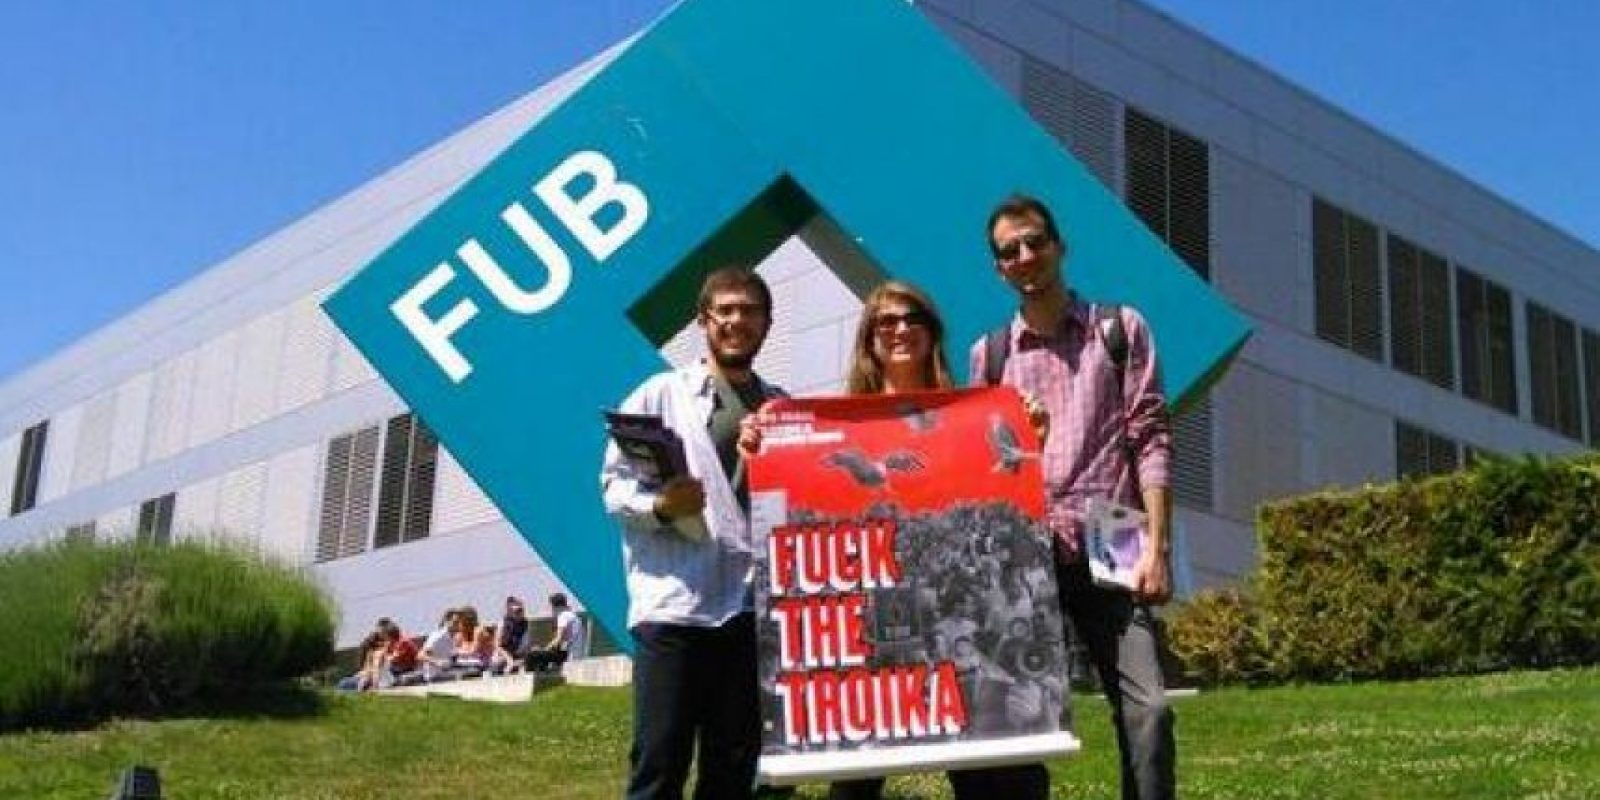 Estudió en la Universidad de Barcelona entre 2006 y 2010 Foto:Twitter.com/rossi_delfina